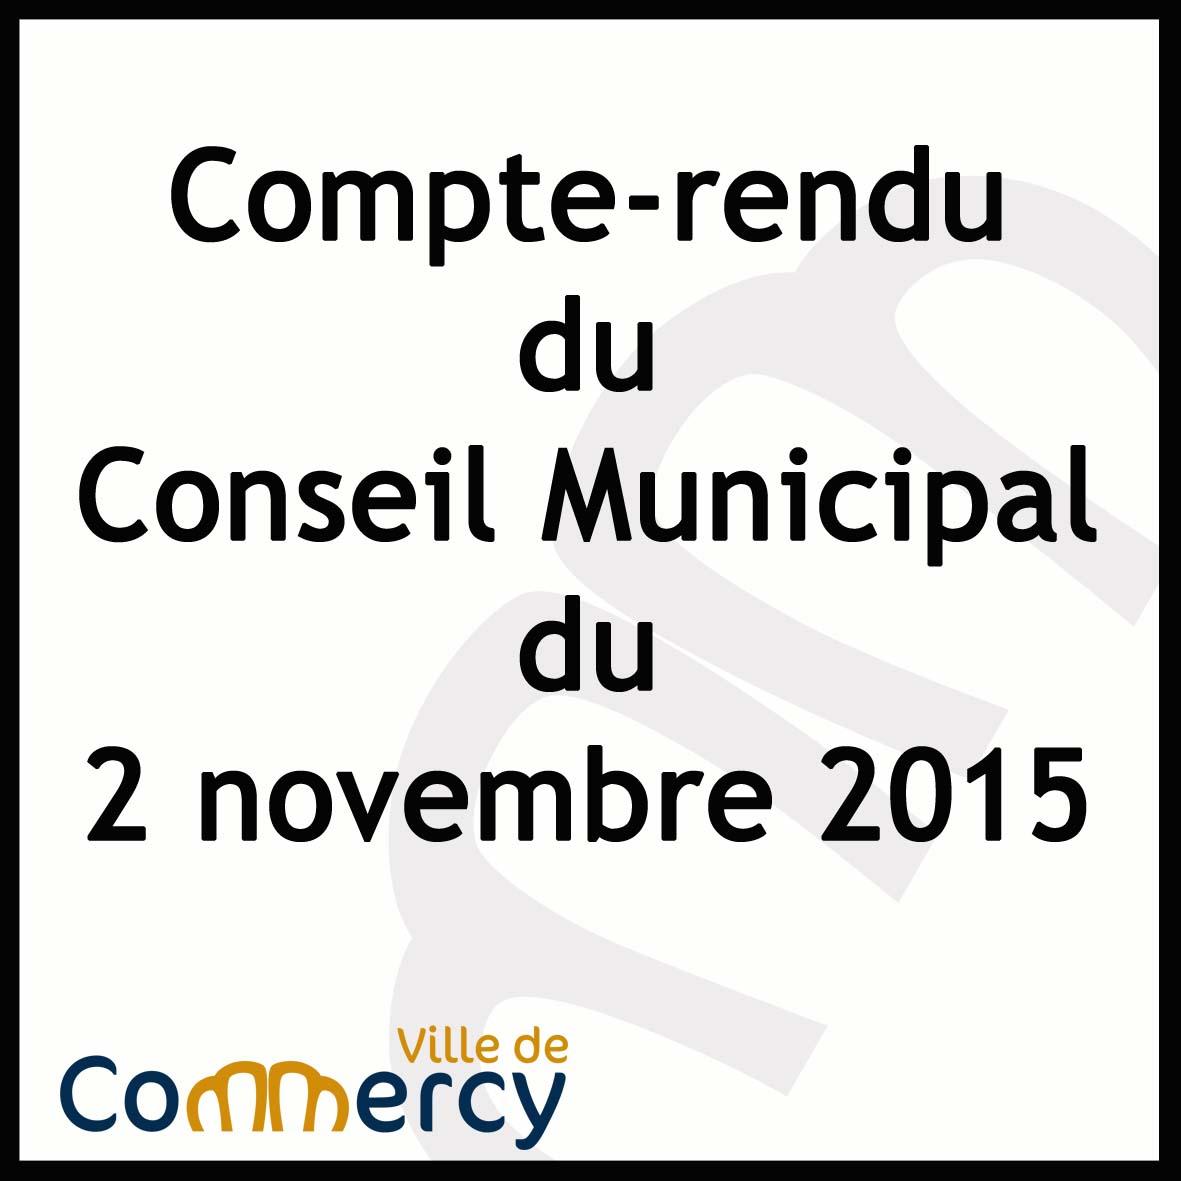 CRCM_20151102